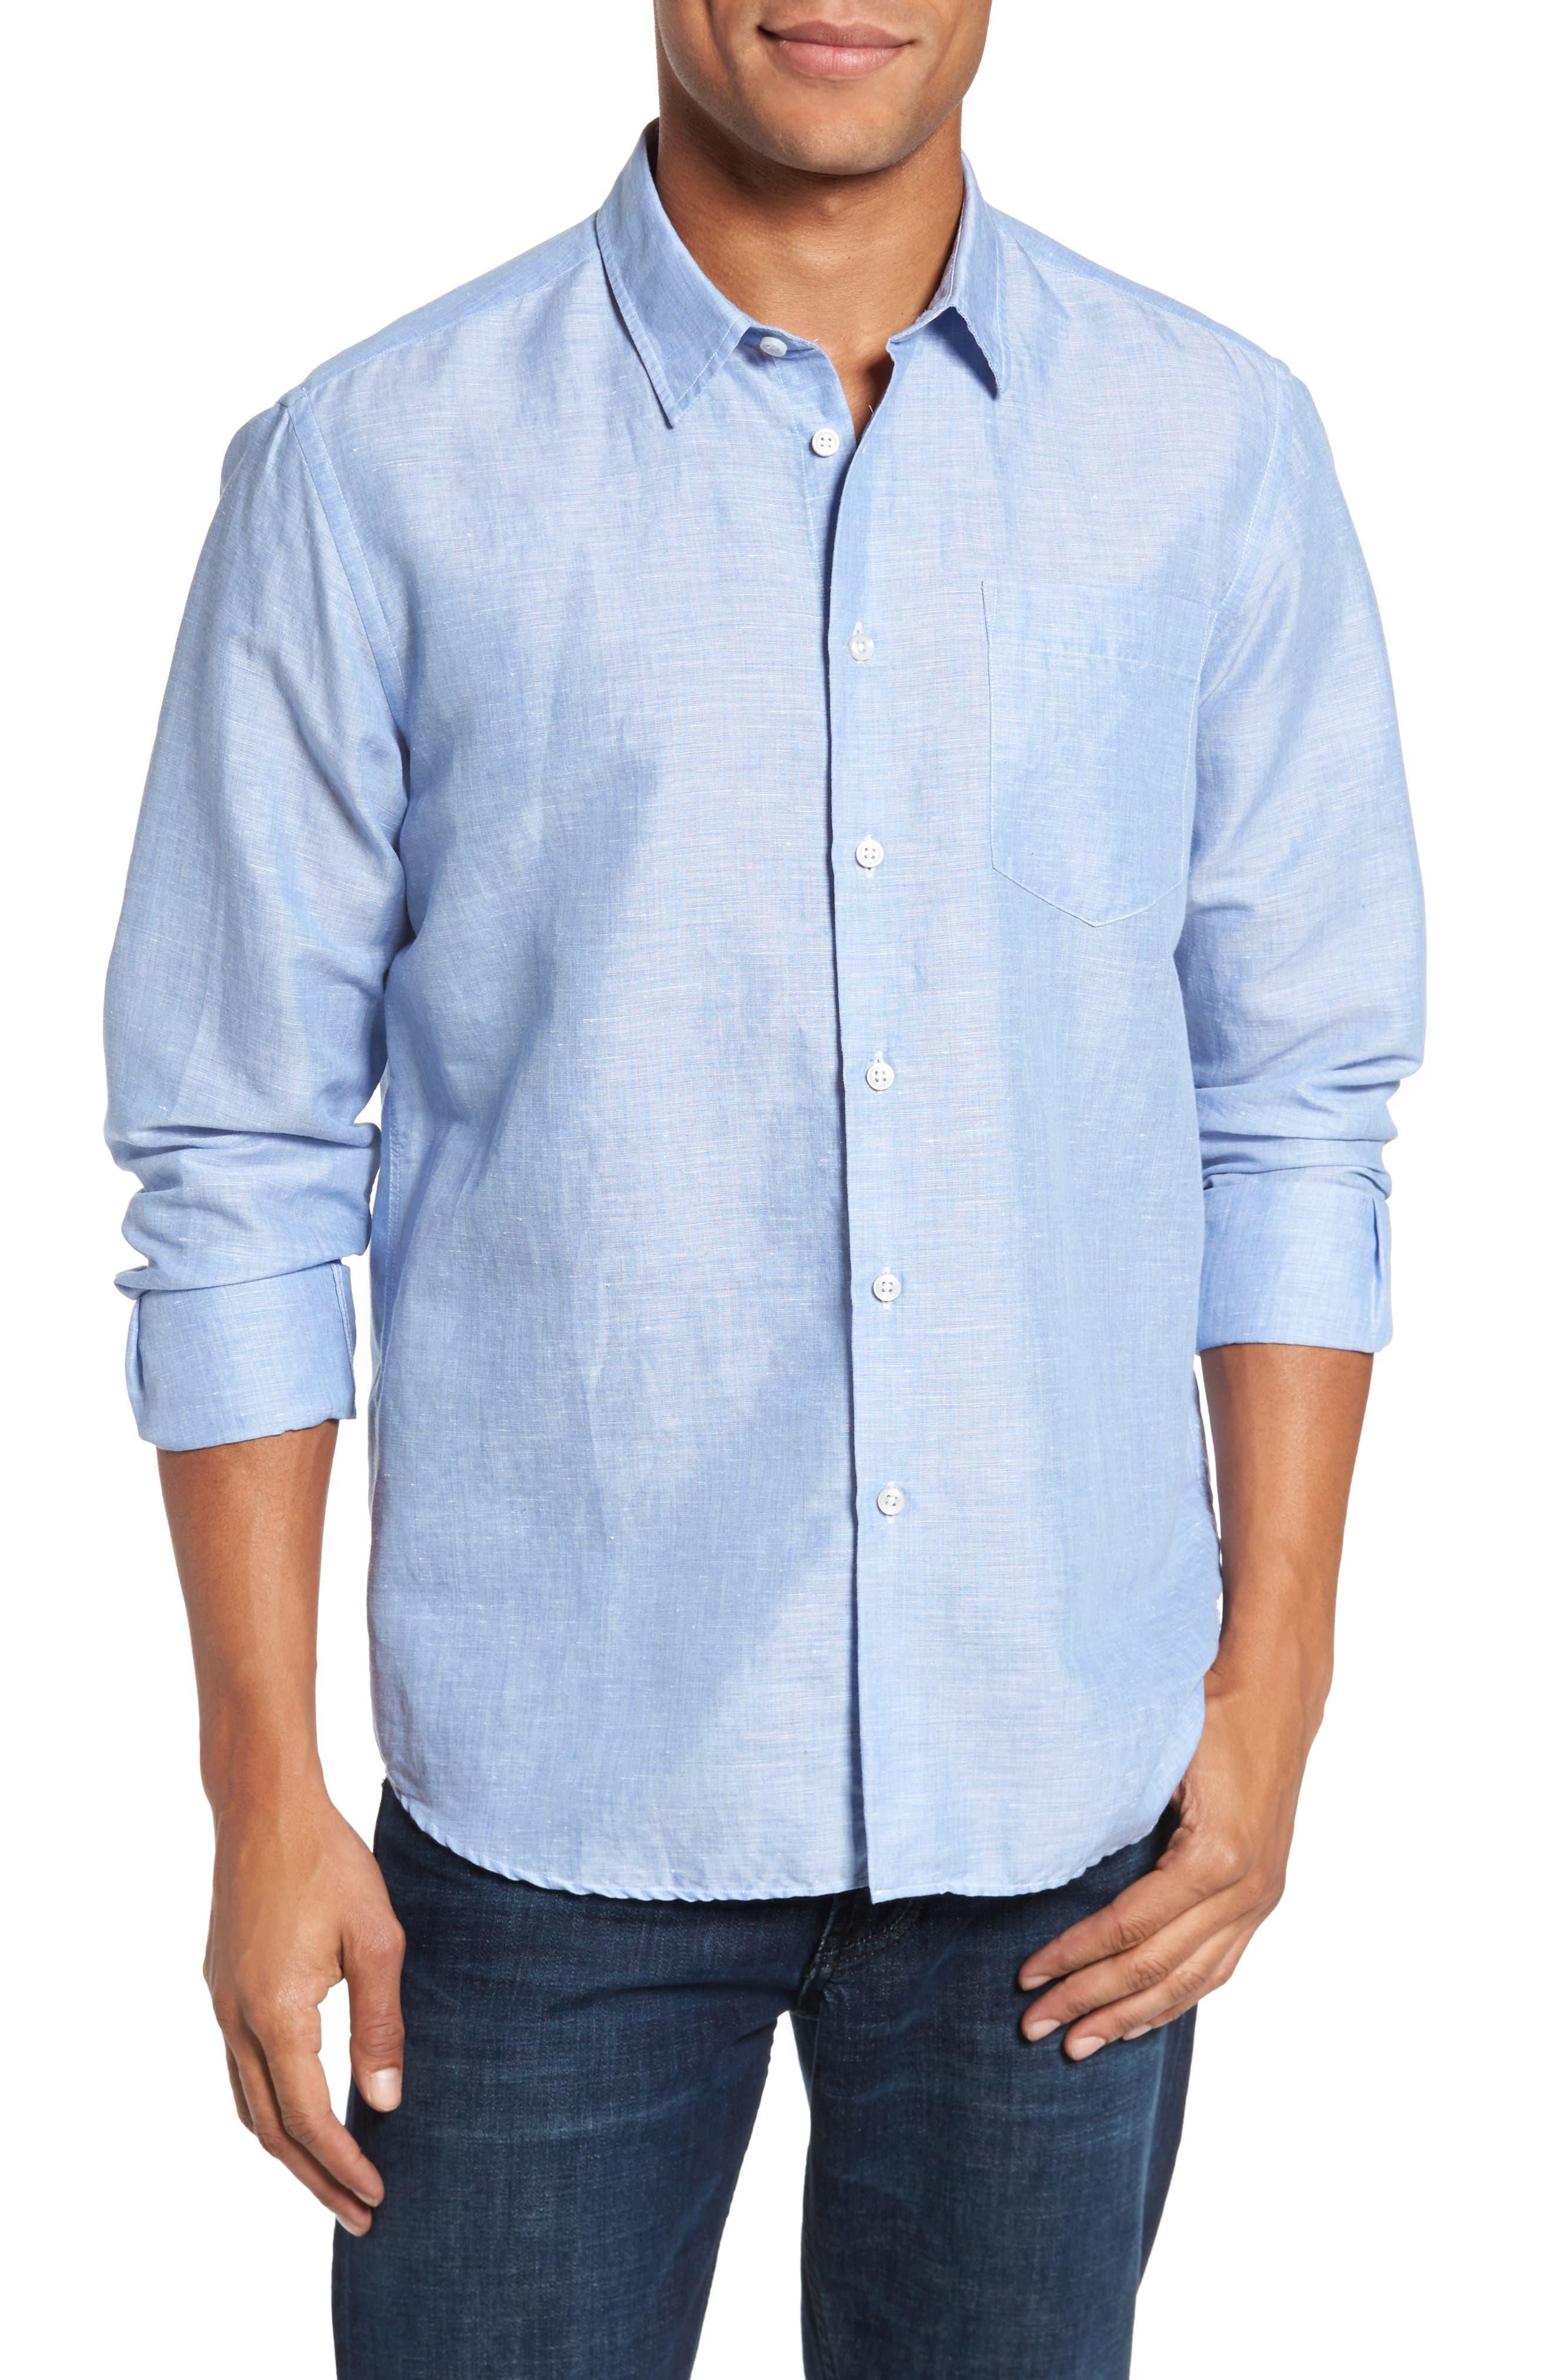 Main Image - Vilebrequin Linen & Cotton Sport Shirt